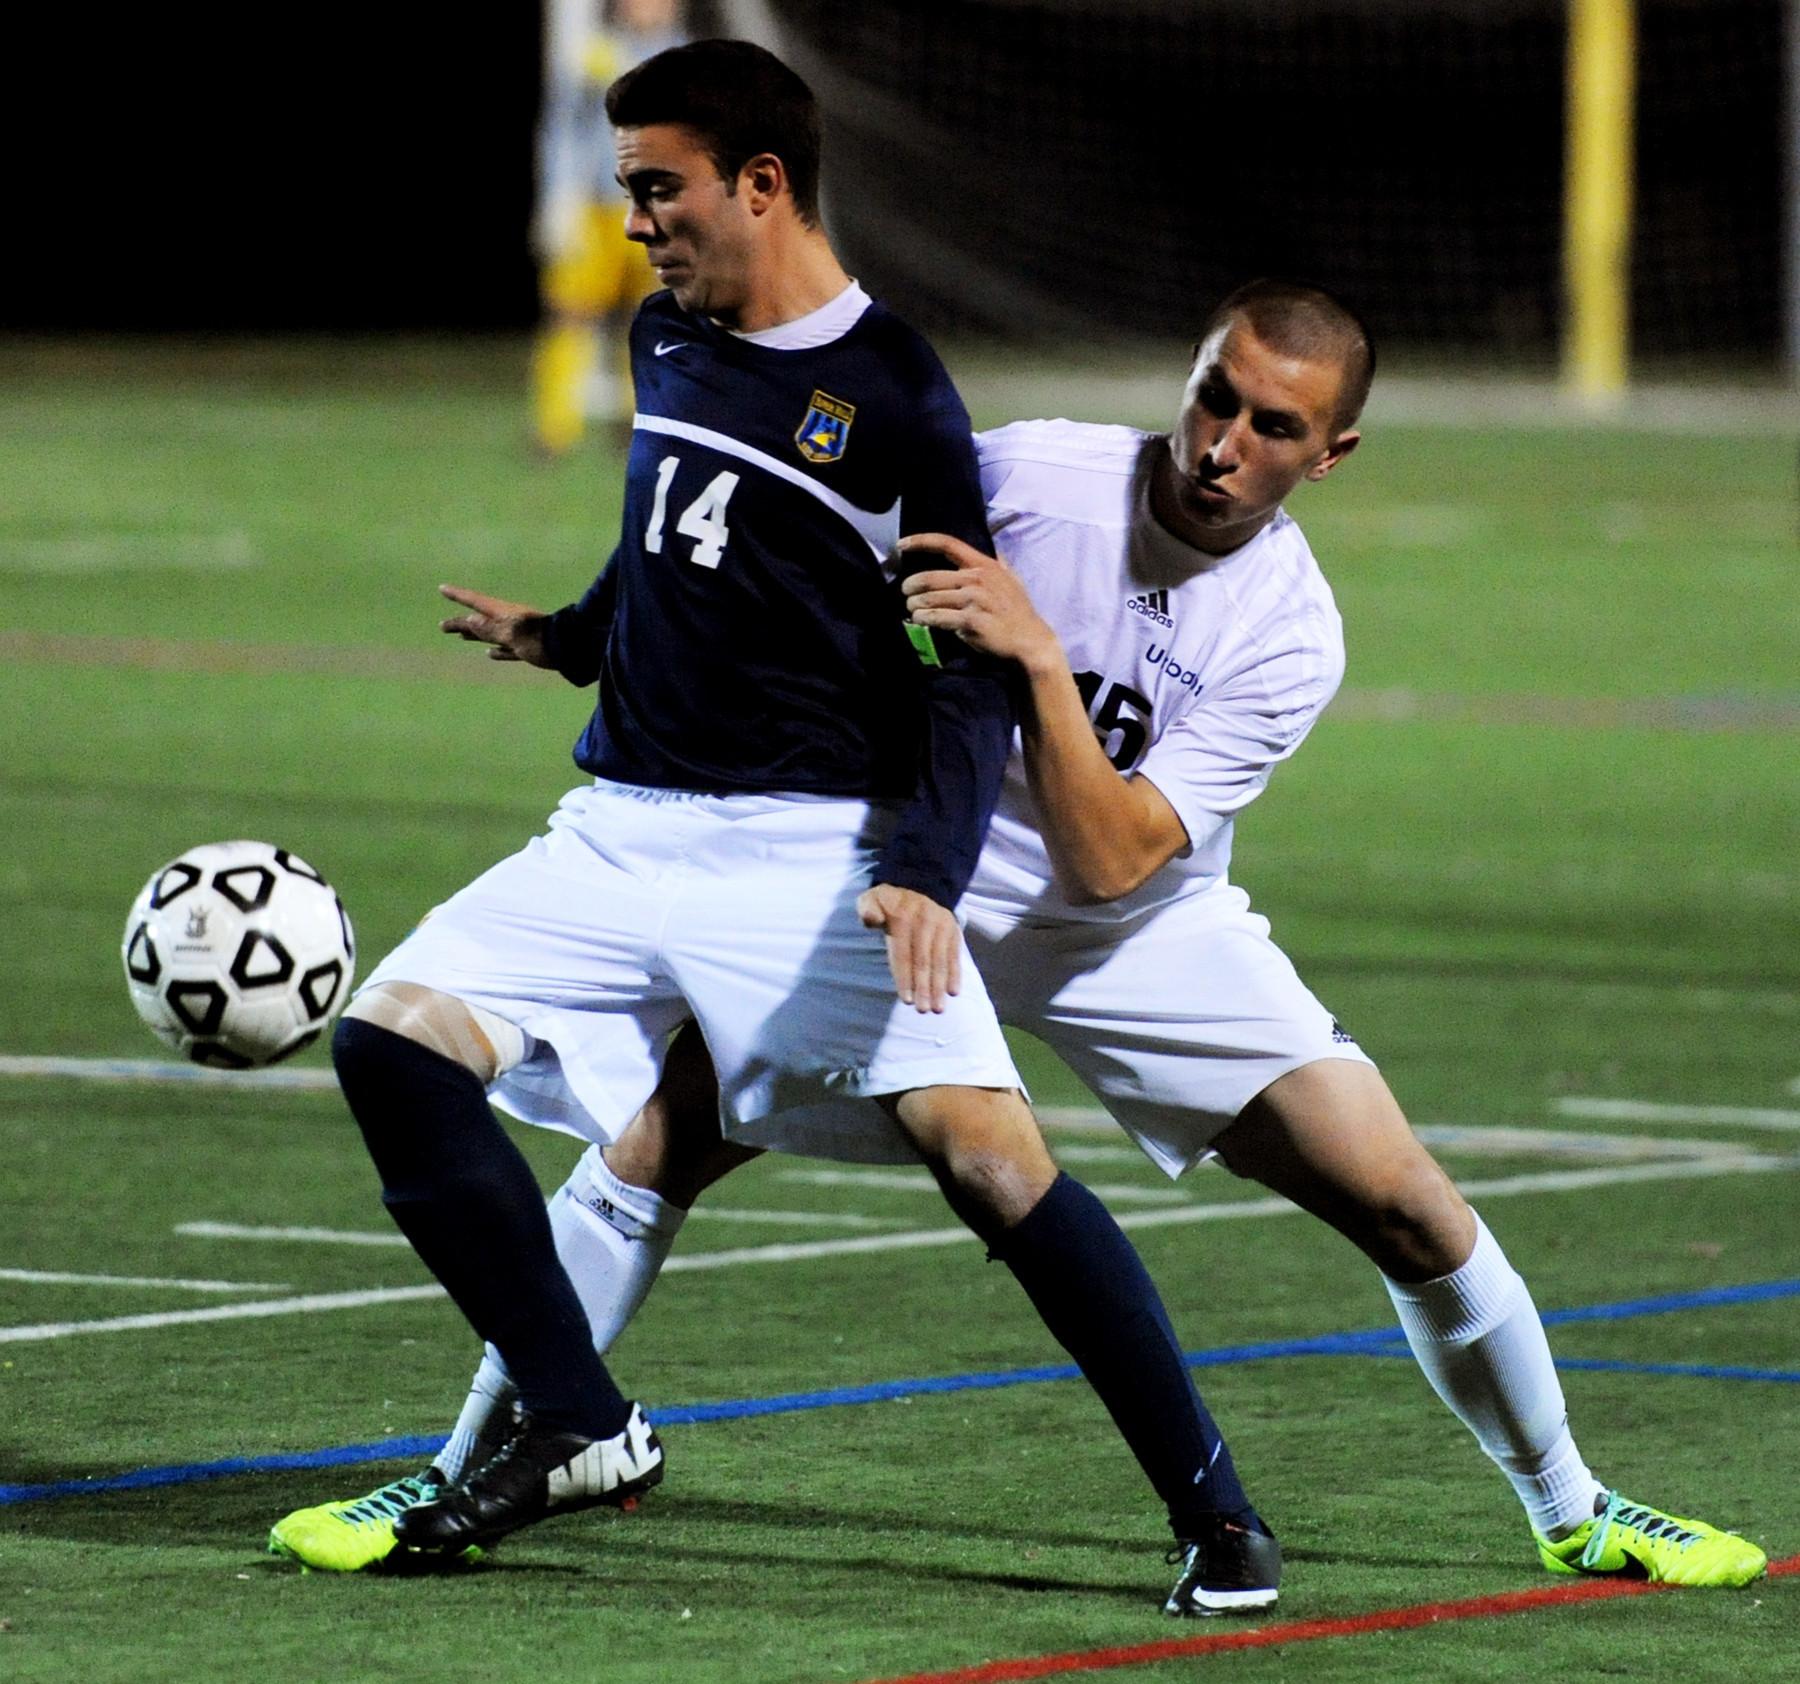 Urbana beats River Hill in 3A boys soccer semifinals ...